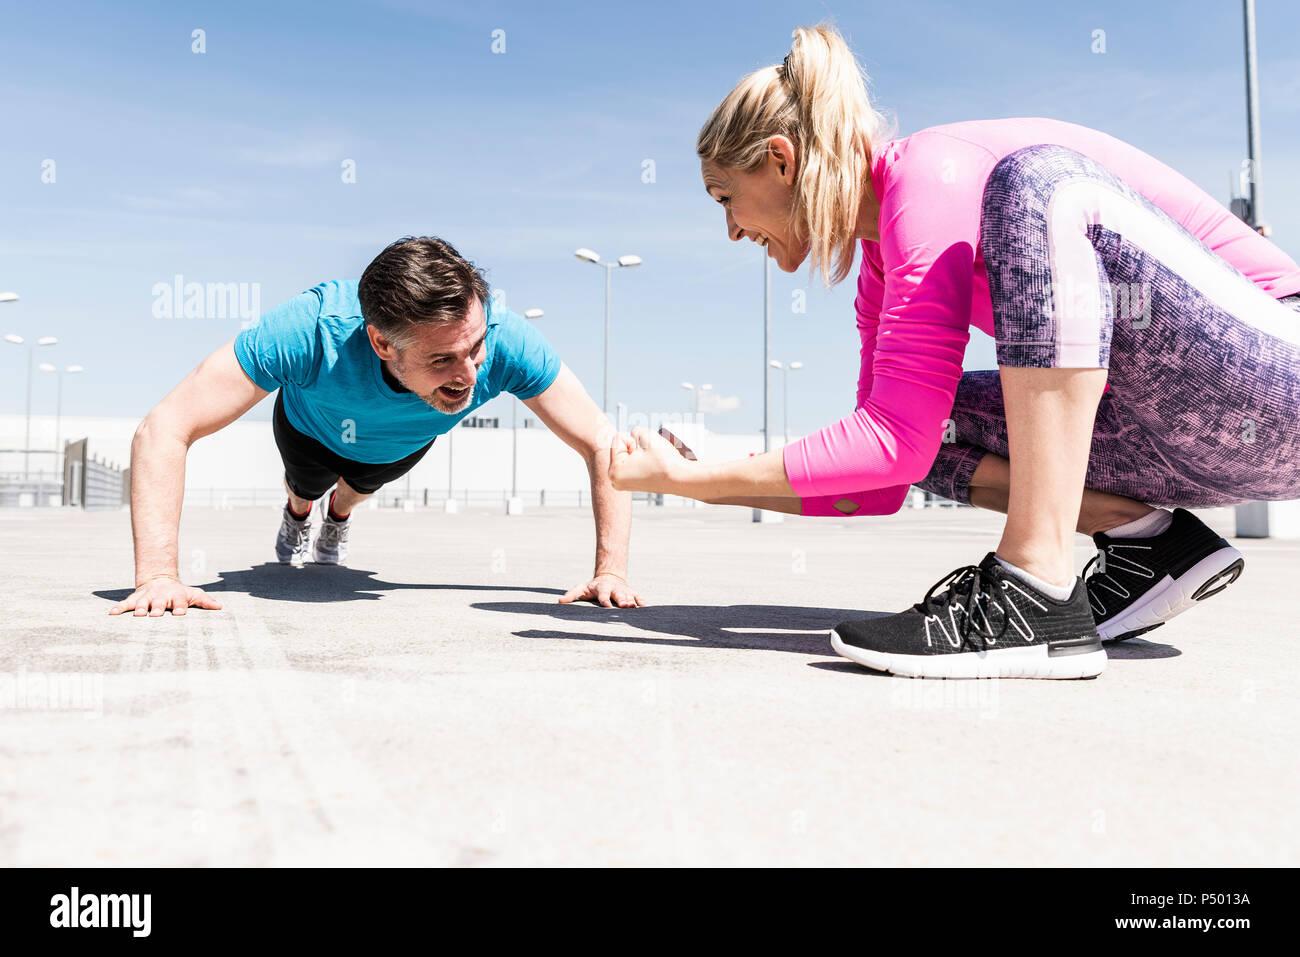 L'uomo exerfining pushups, donna lui di coaching Immagini Stock